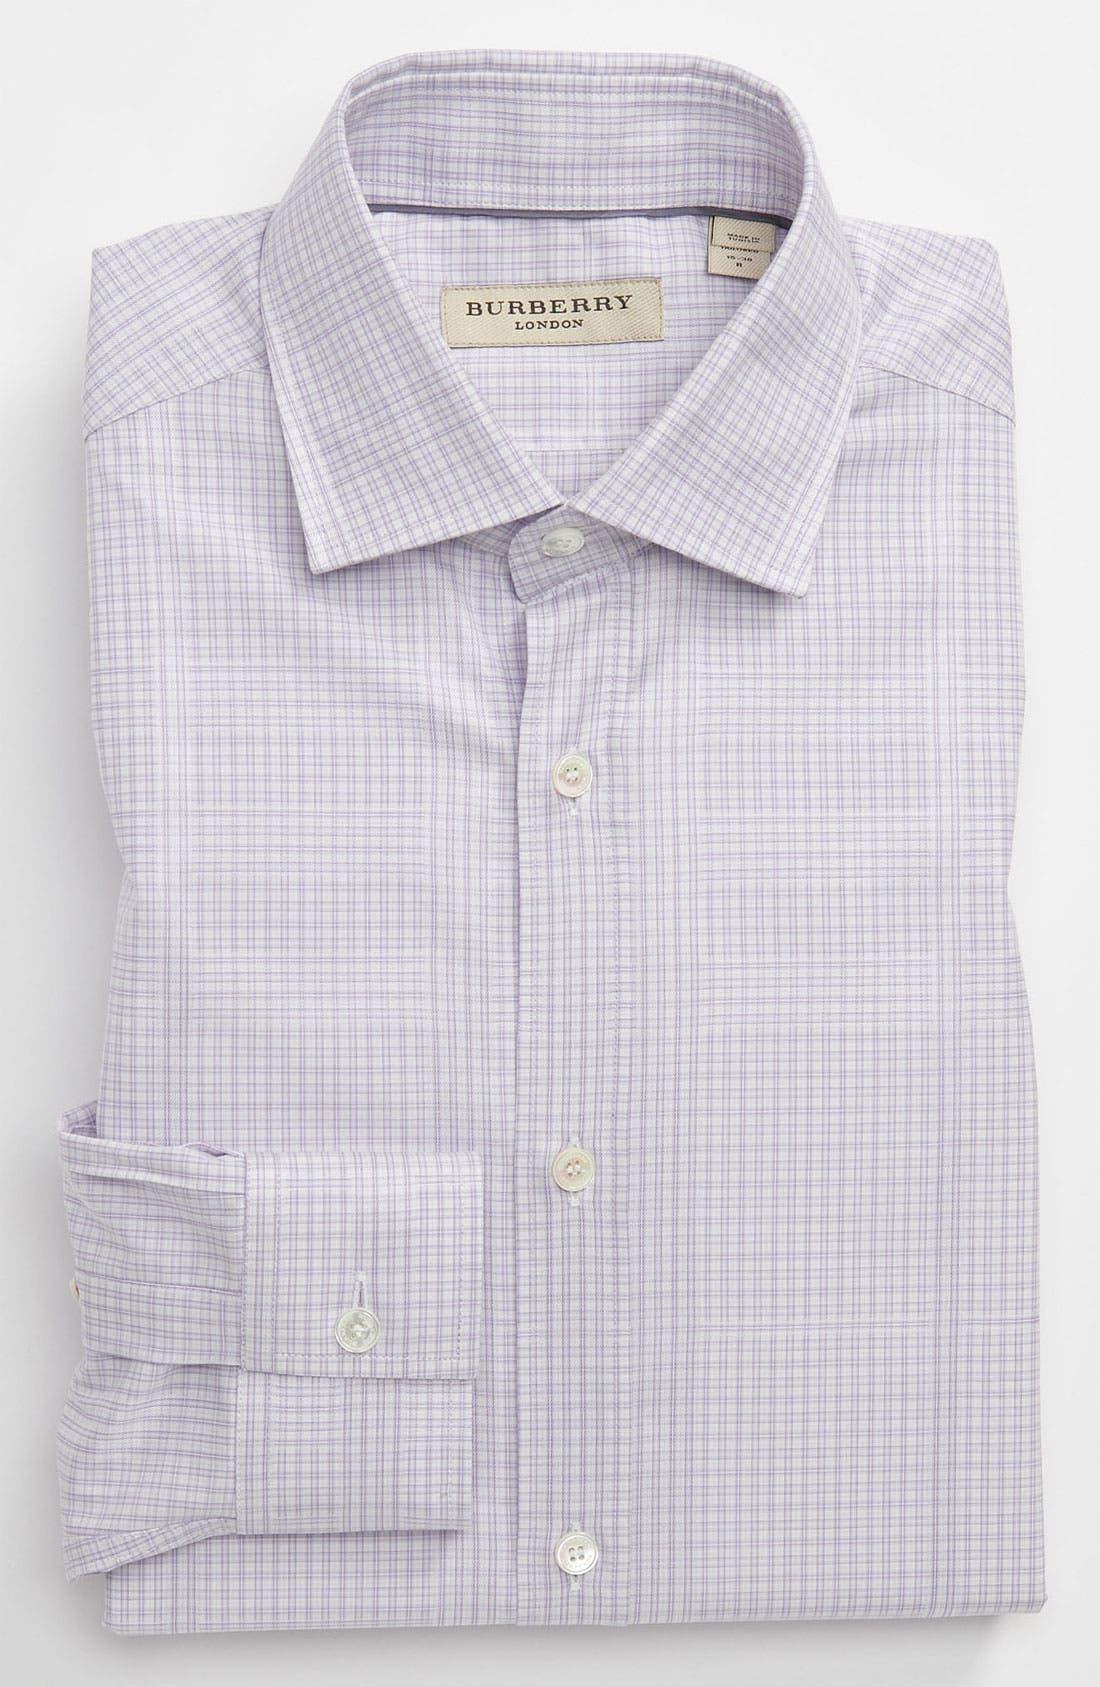 Main Image - Burberry London Modern Fit Dress Shirt